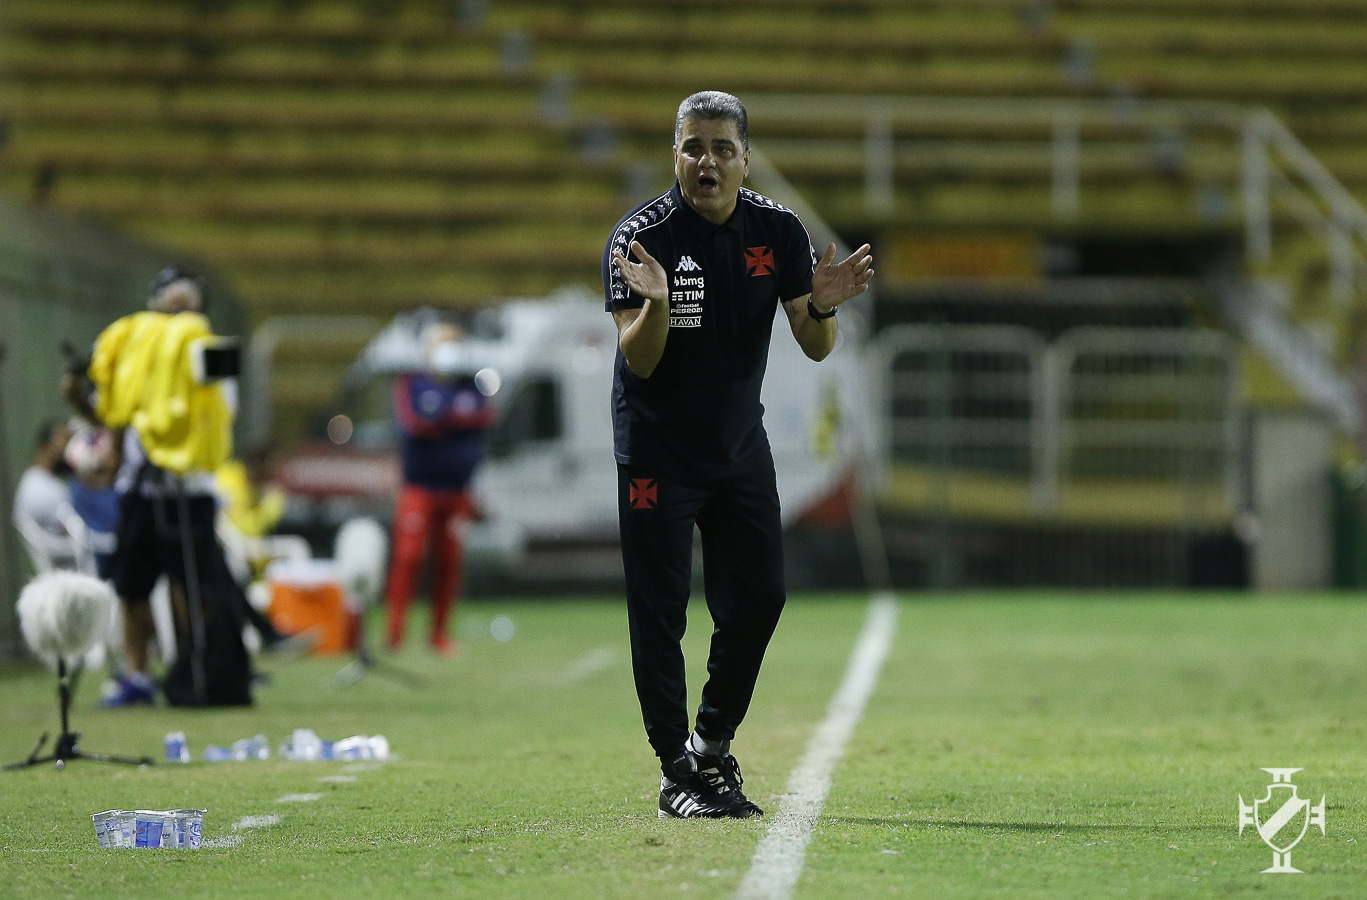 De camisa preta, Marcelo Cabo orienta o time do Vasco